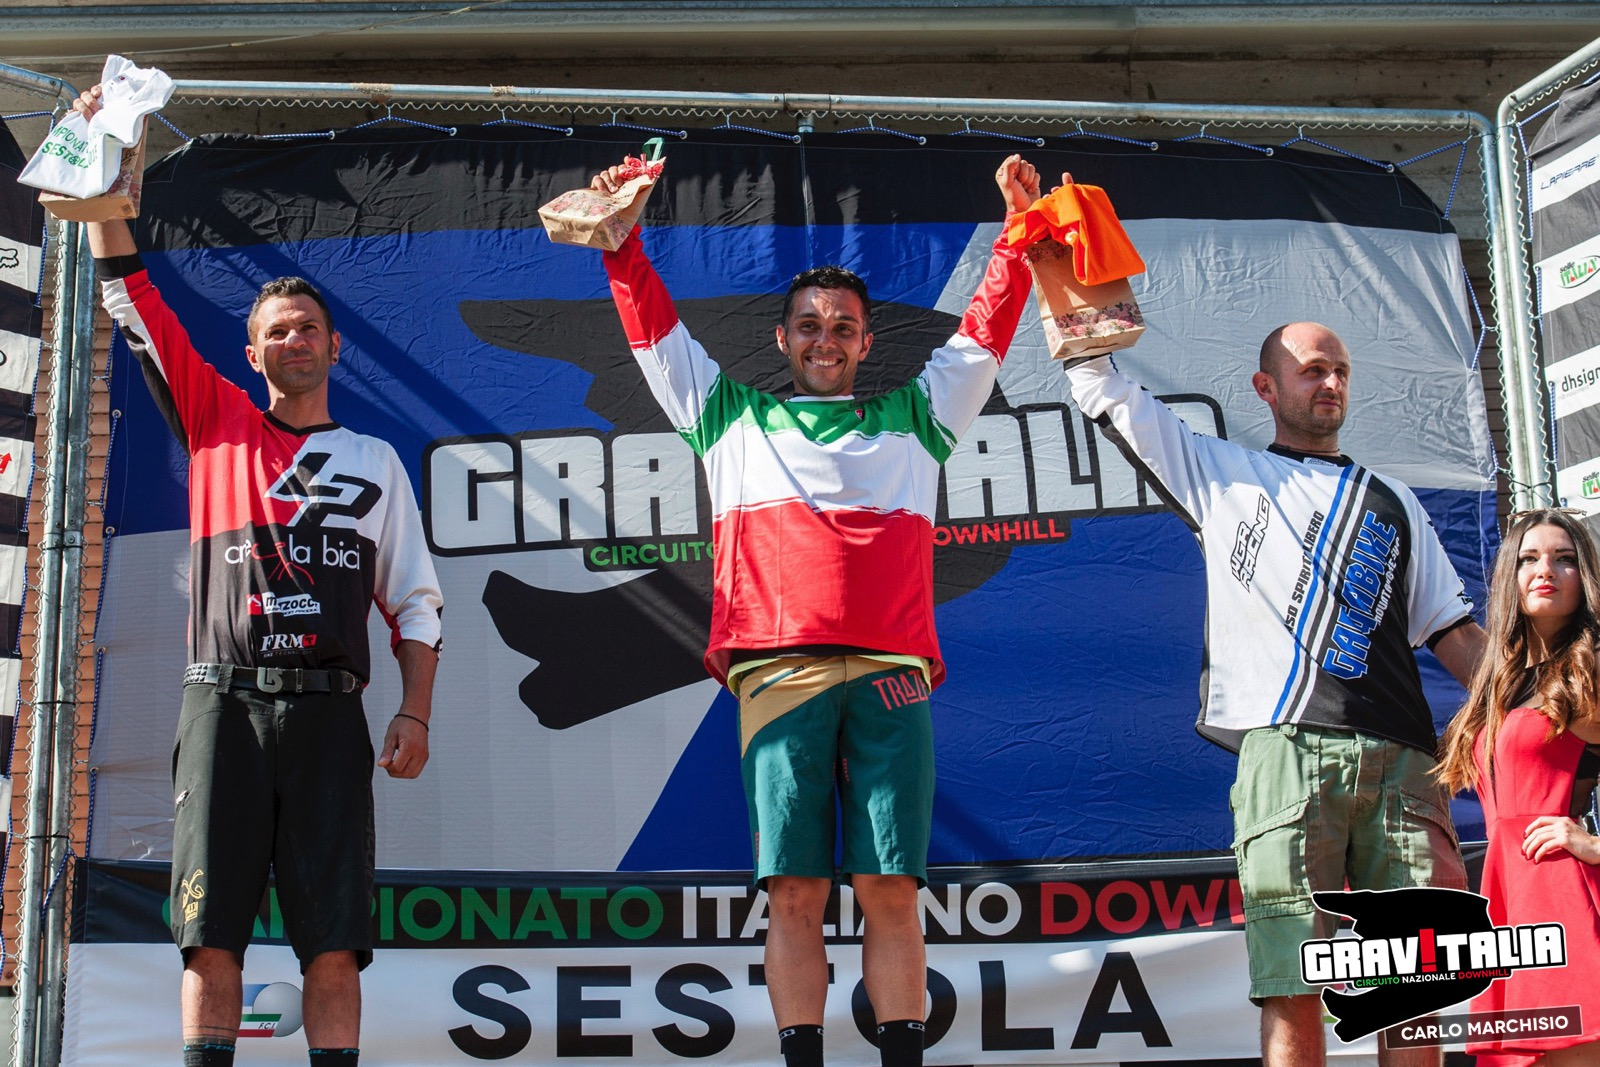 PhotoCarloMarchisio_GIT2015_CampionatiItaliani_Sestola_054